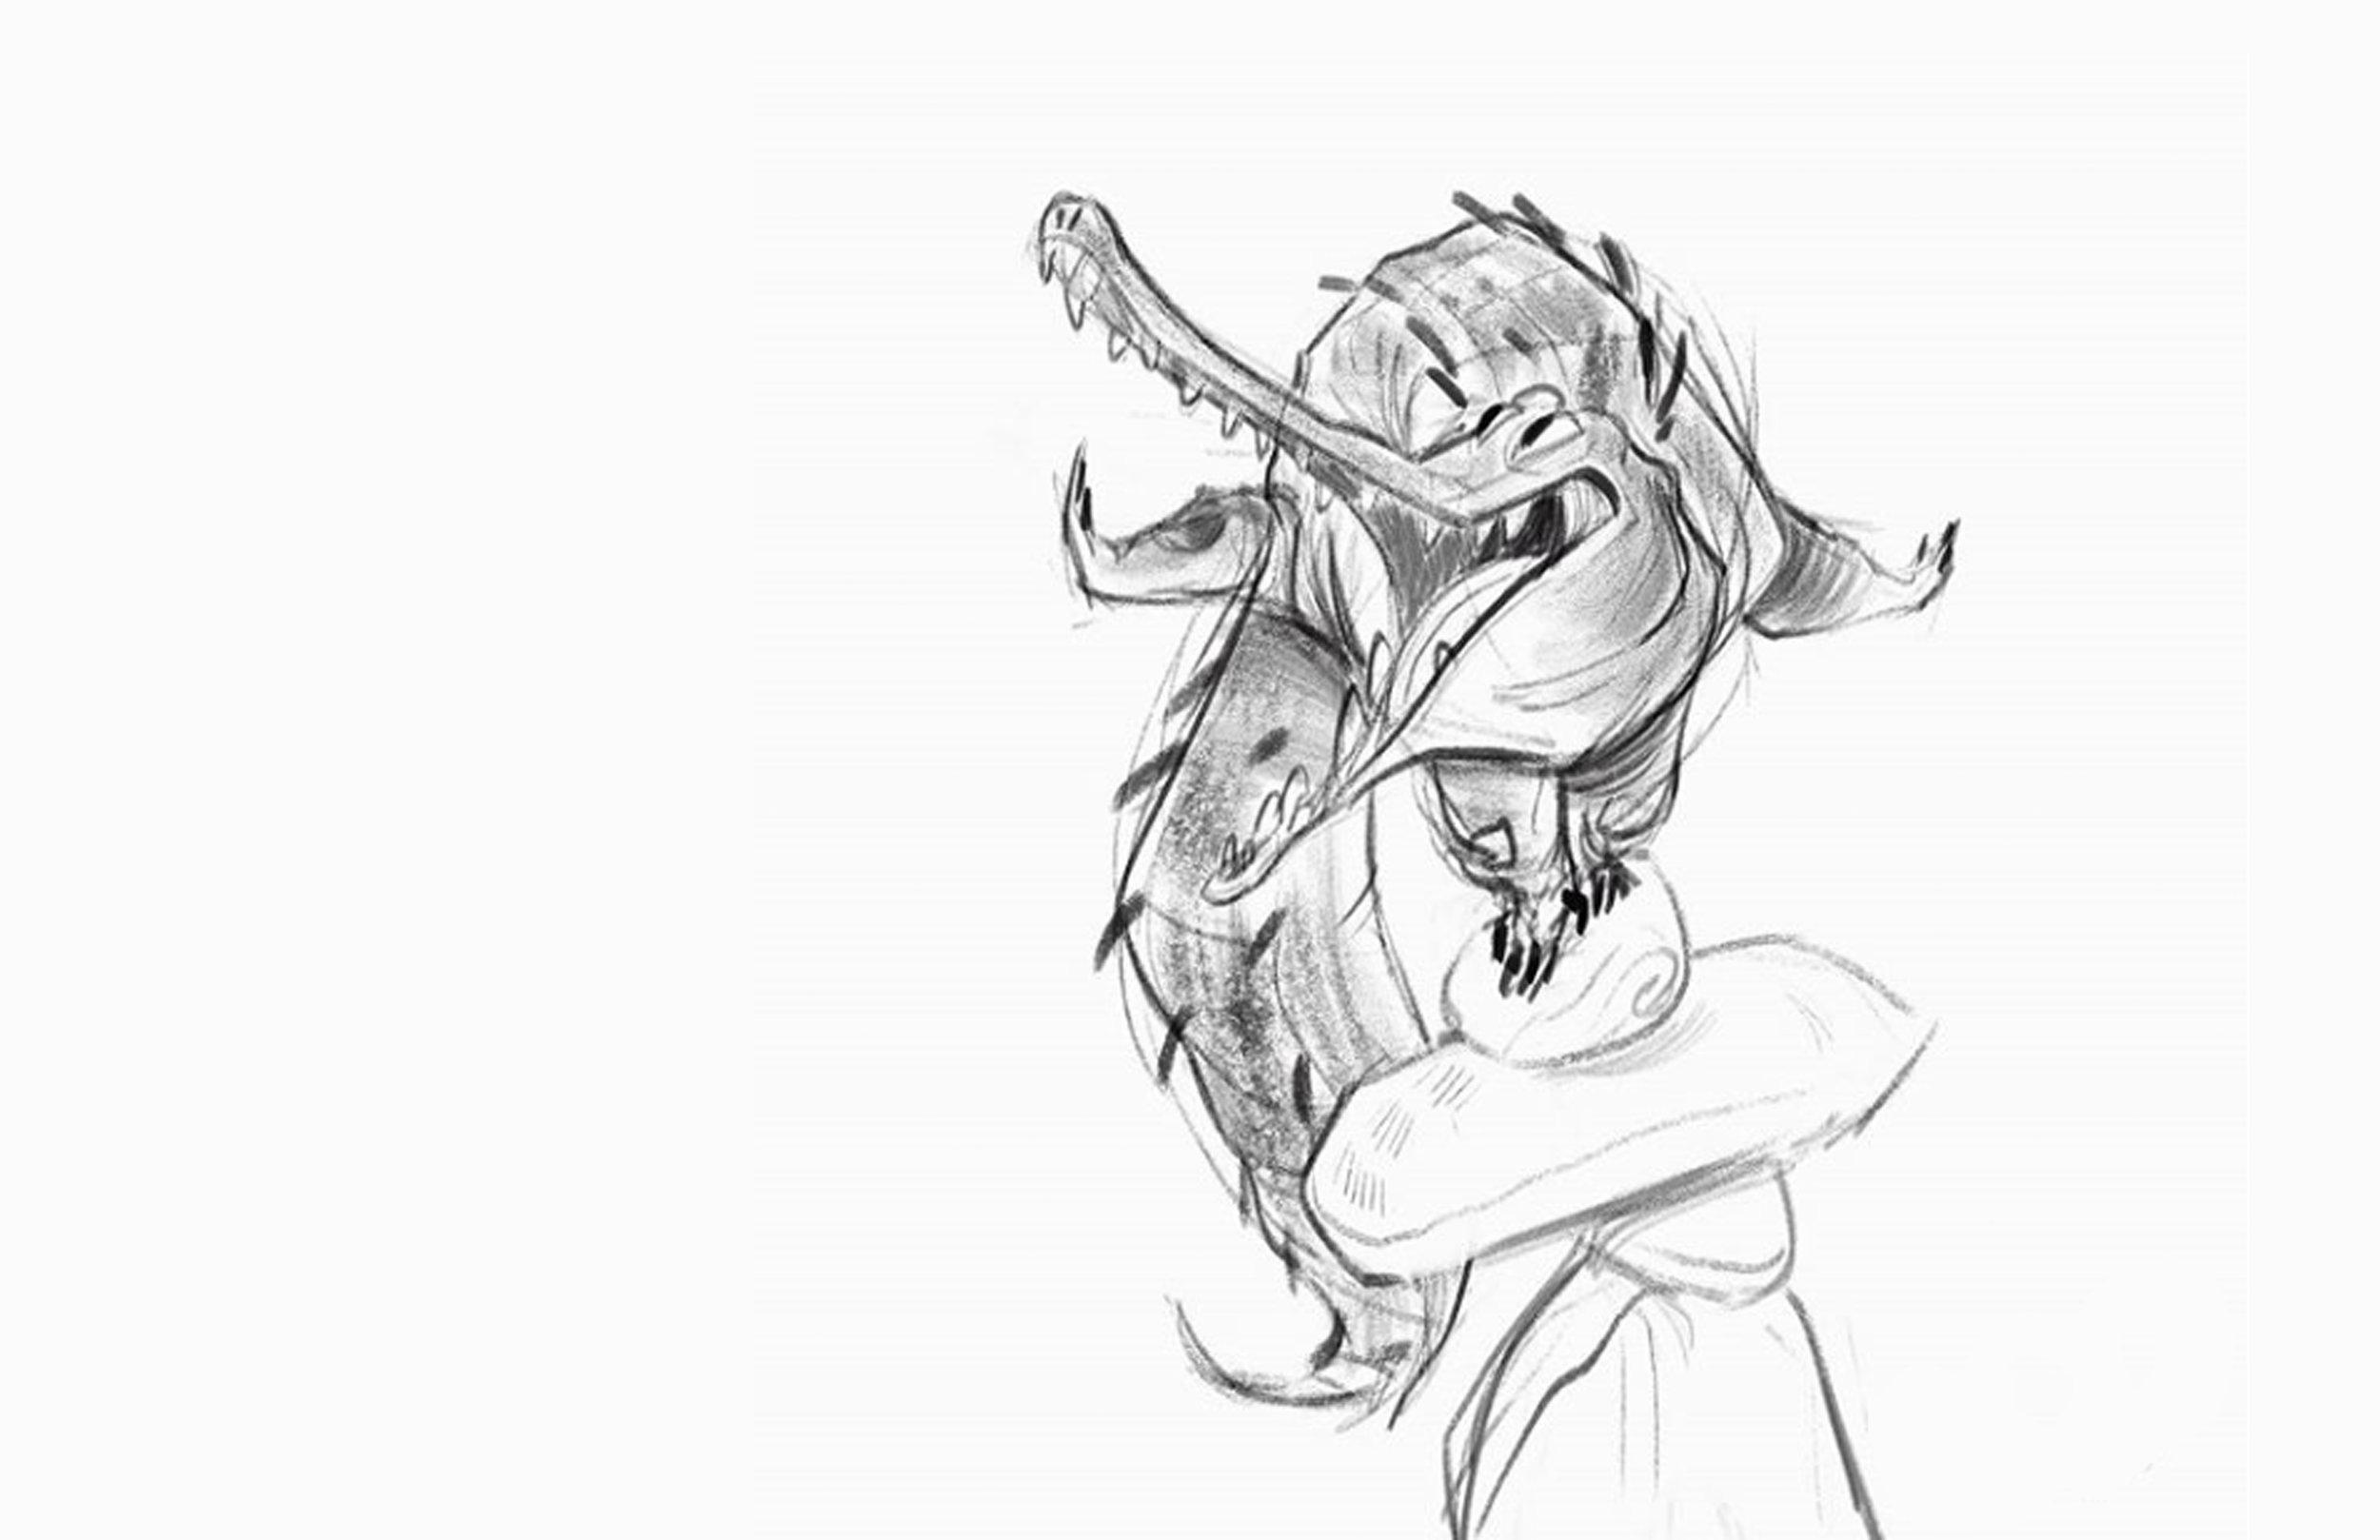 RizoStephanie-Artwork02.jpg